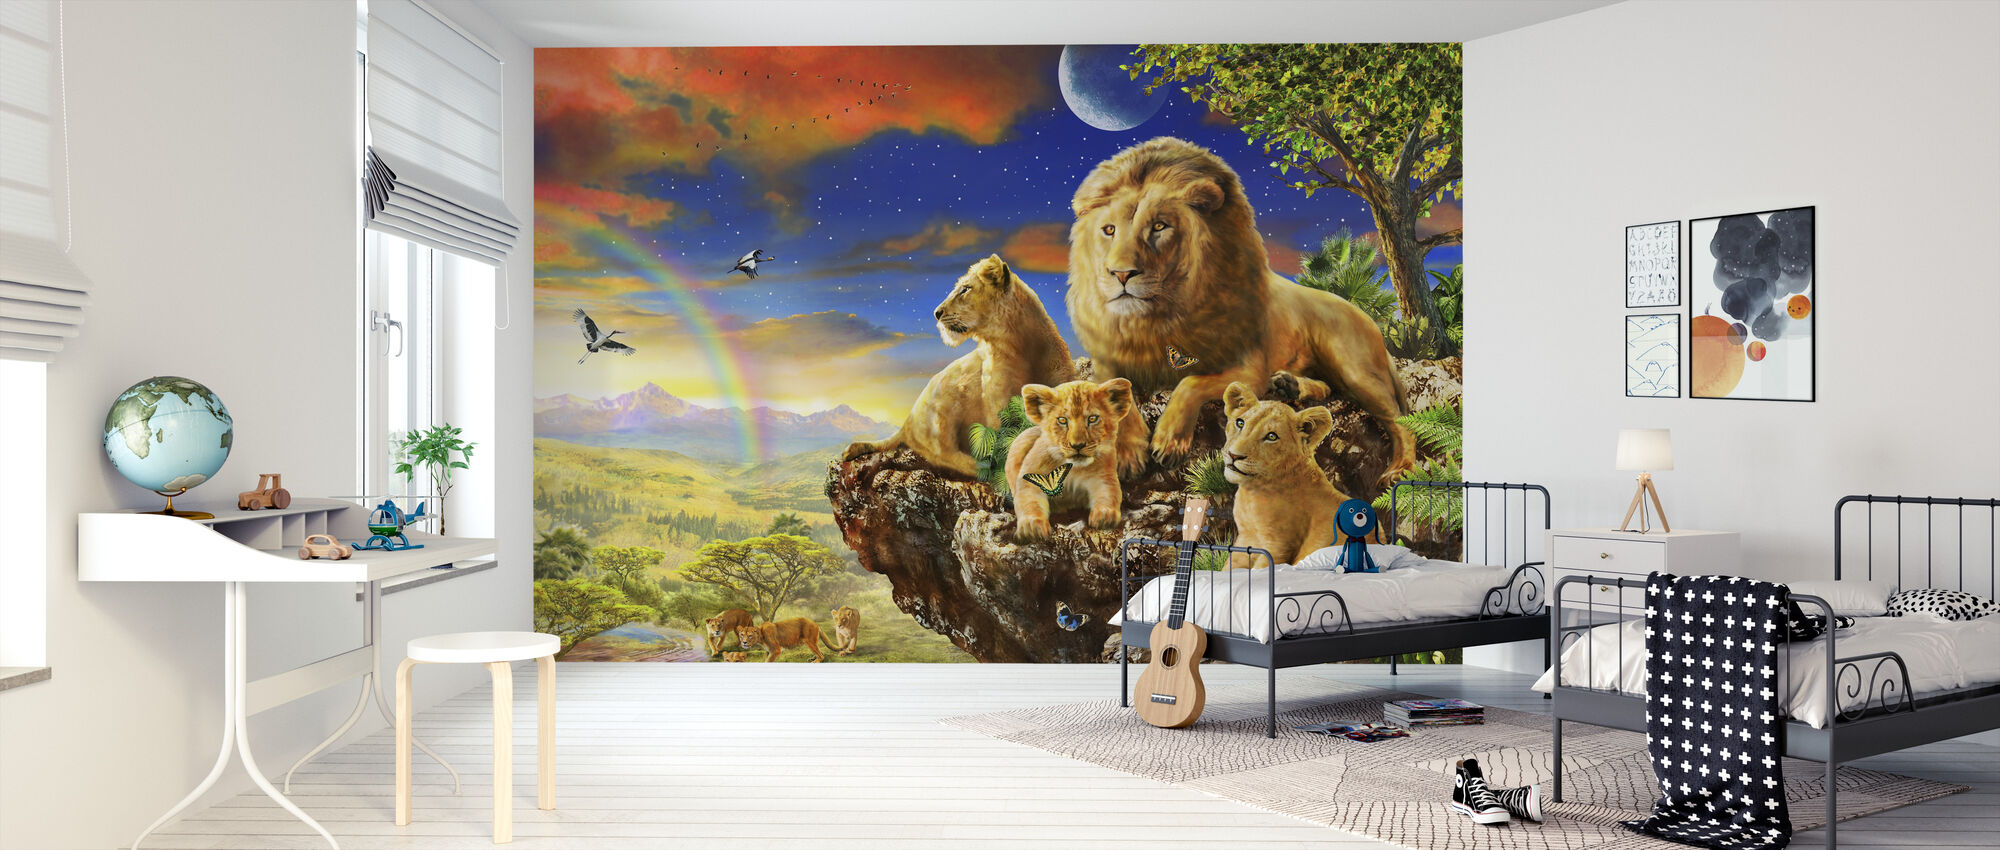 Leeuwenrots - Behang - Kinderkamer